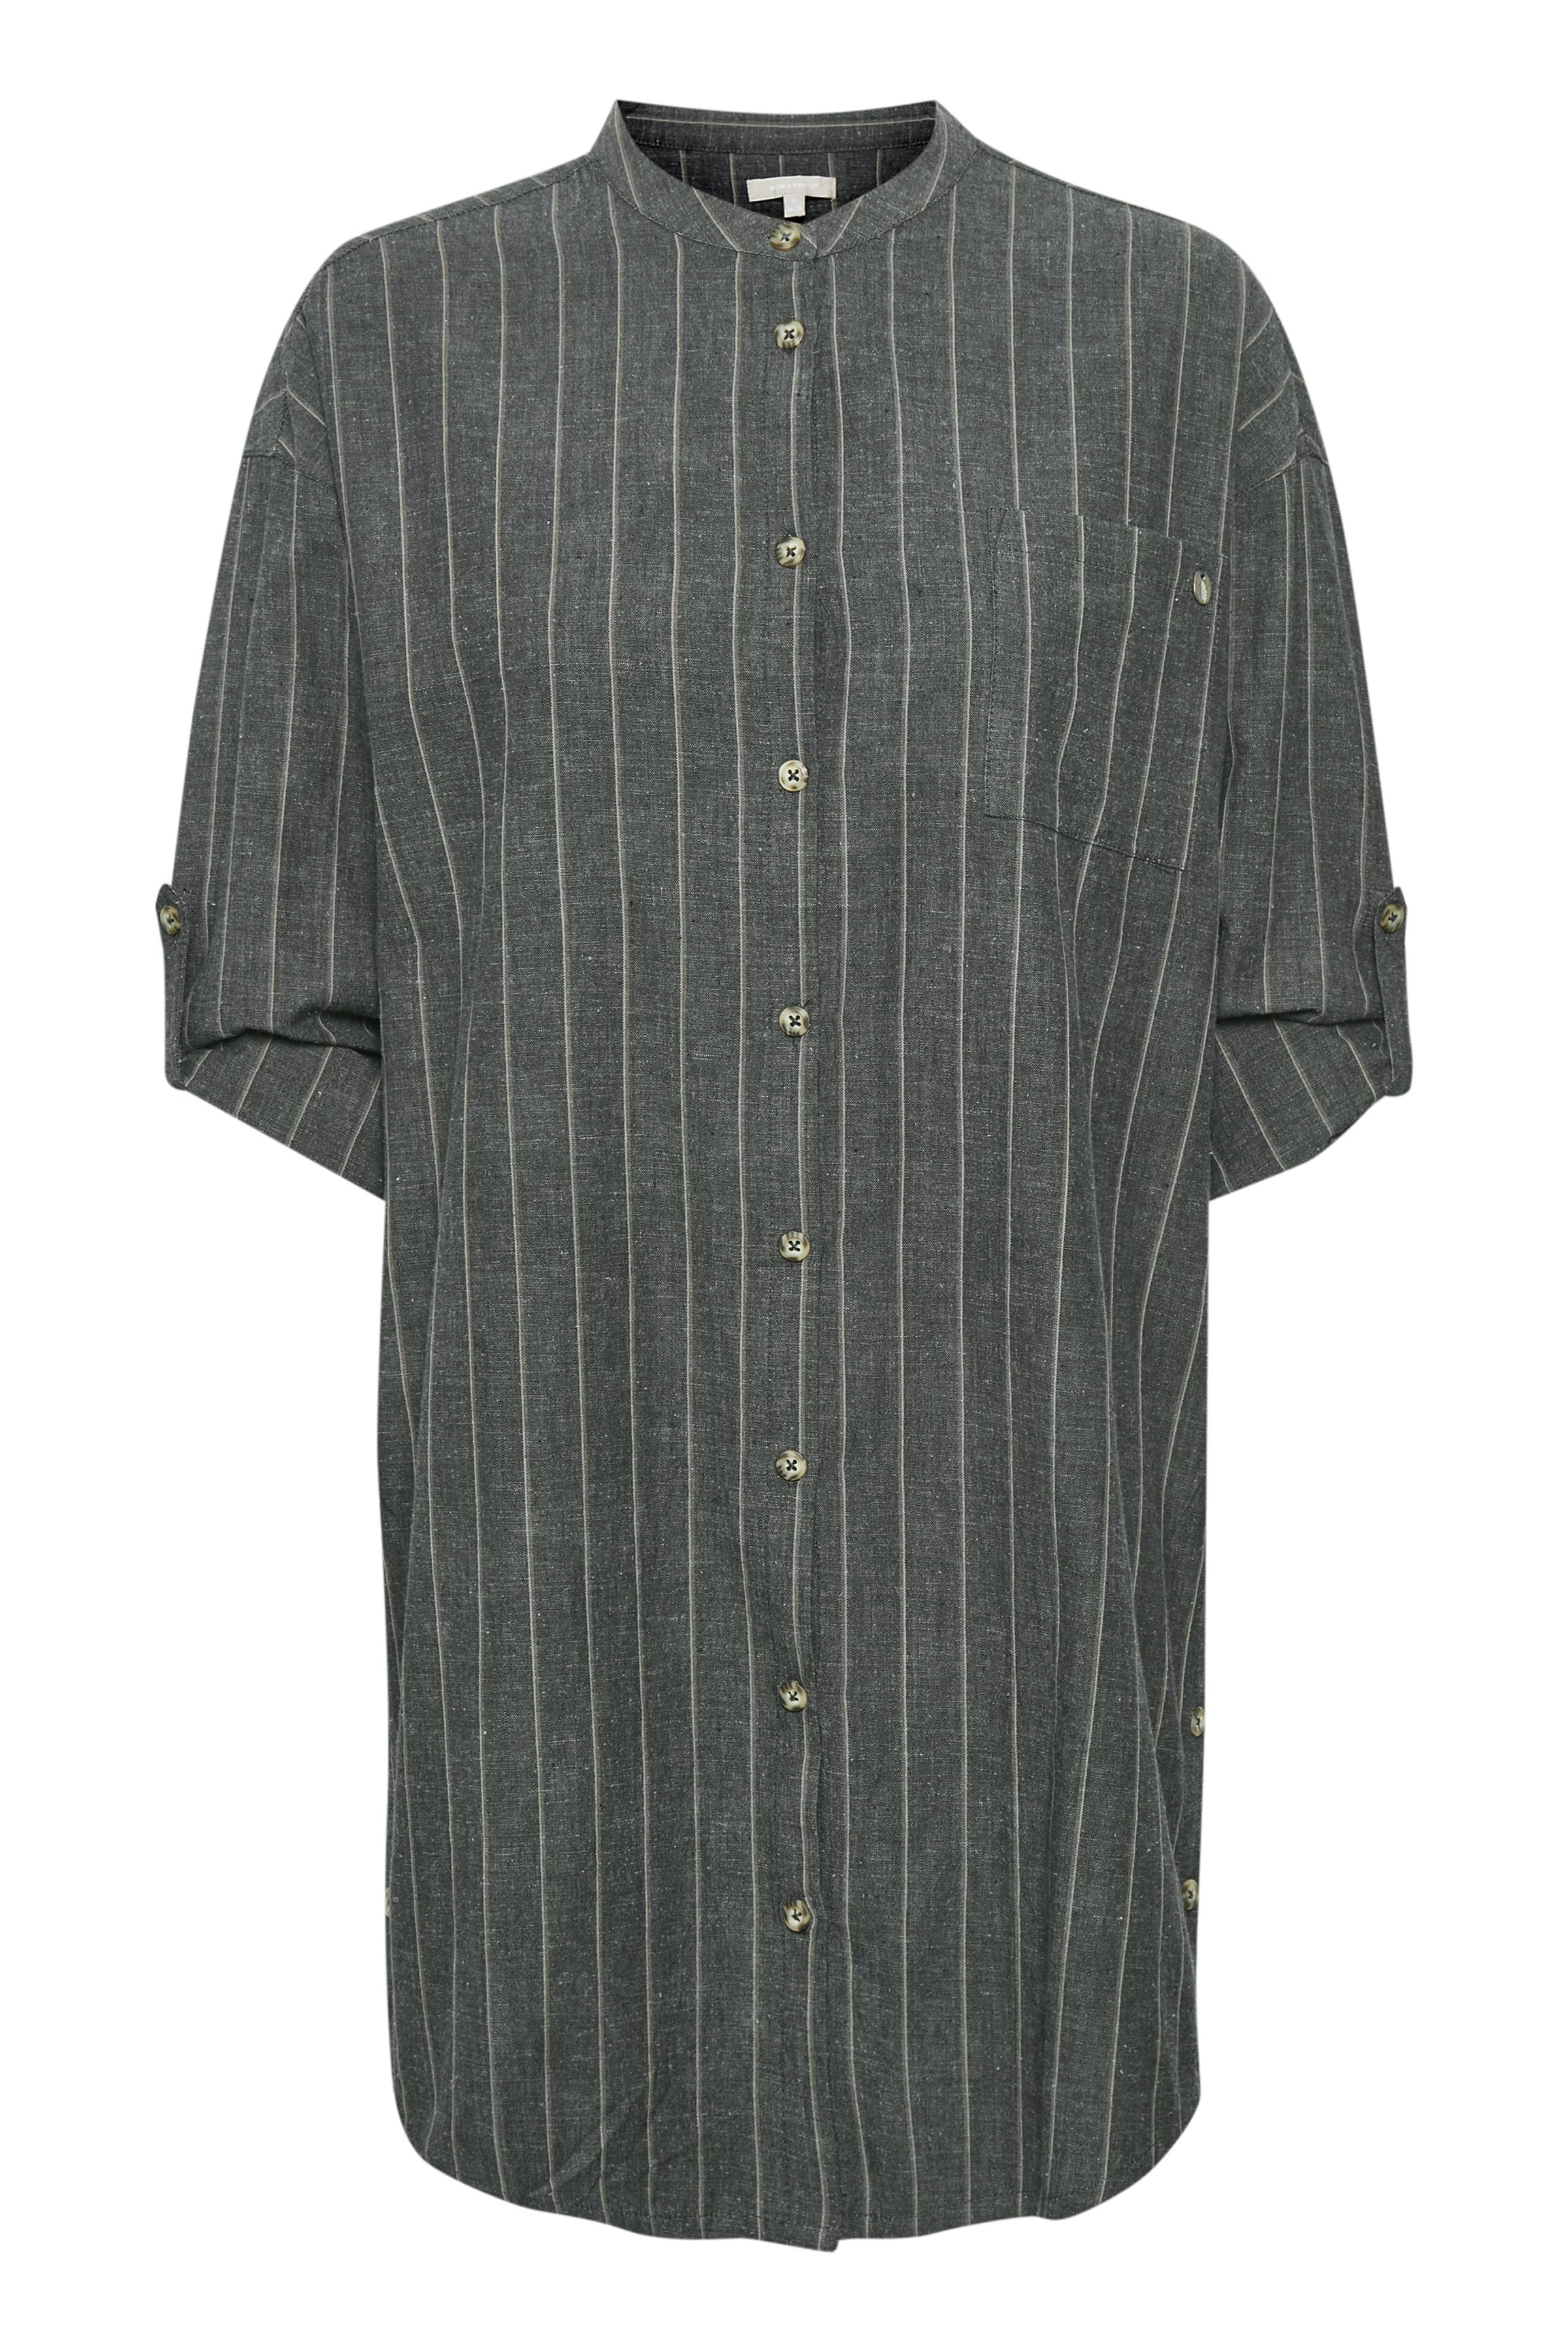 Koksgrå/grå Tunika fra Bon'A Parte – Køb Koksgrå/grå Tunika fra str. S-2XL her